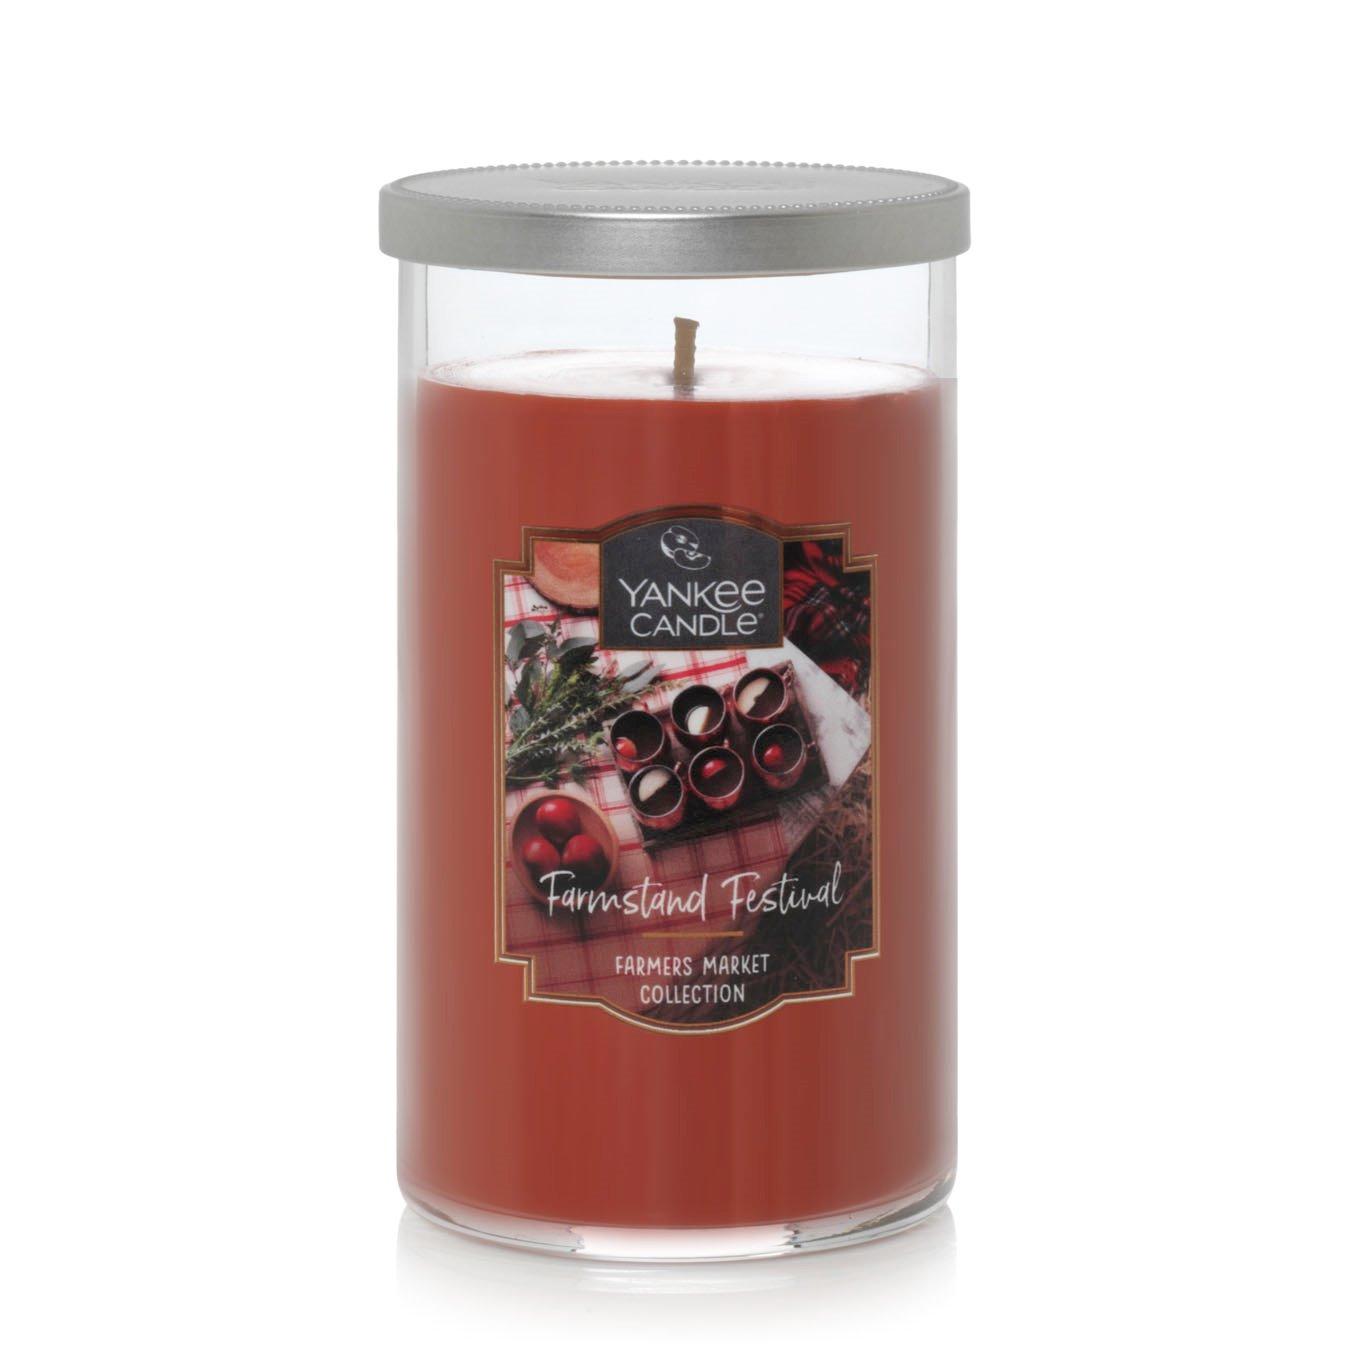 Yankee Candle Farmstand Festival Medium Perfect Pillar Candle